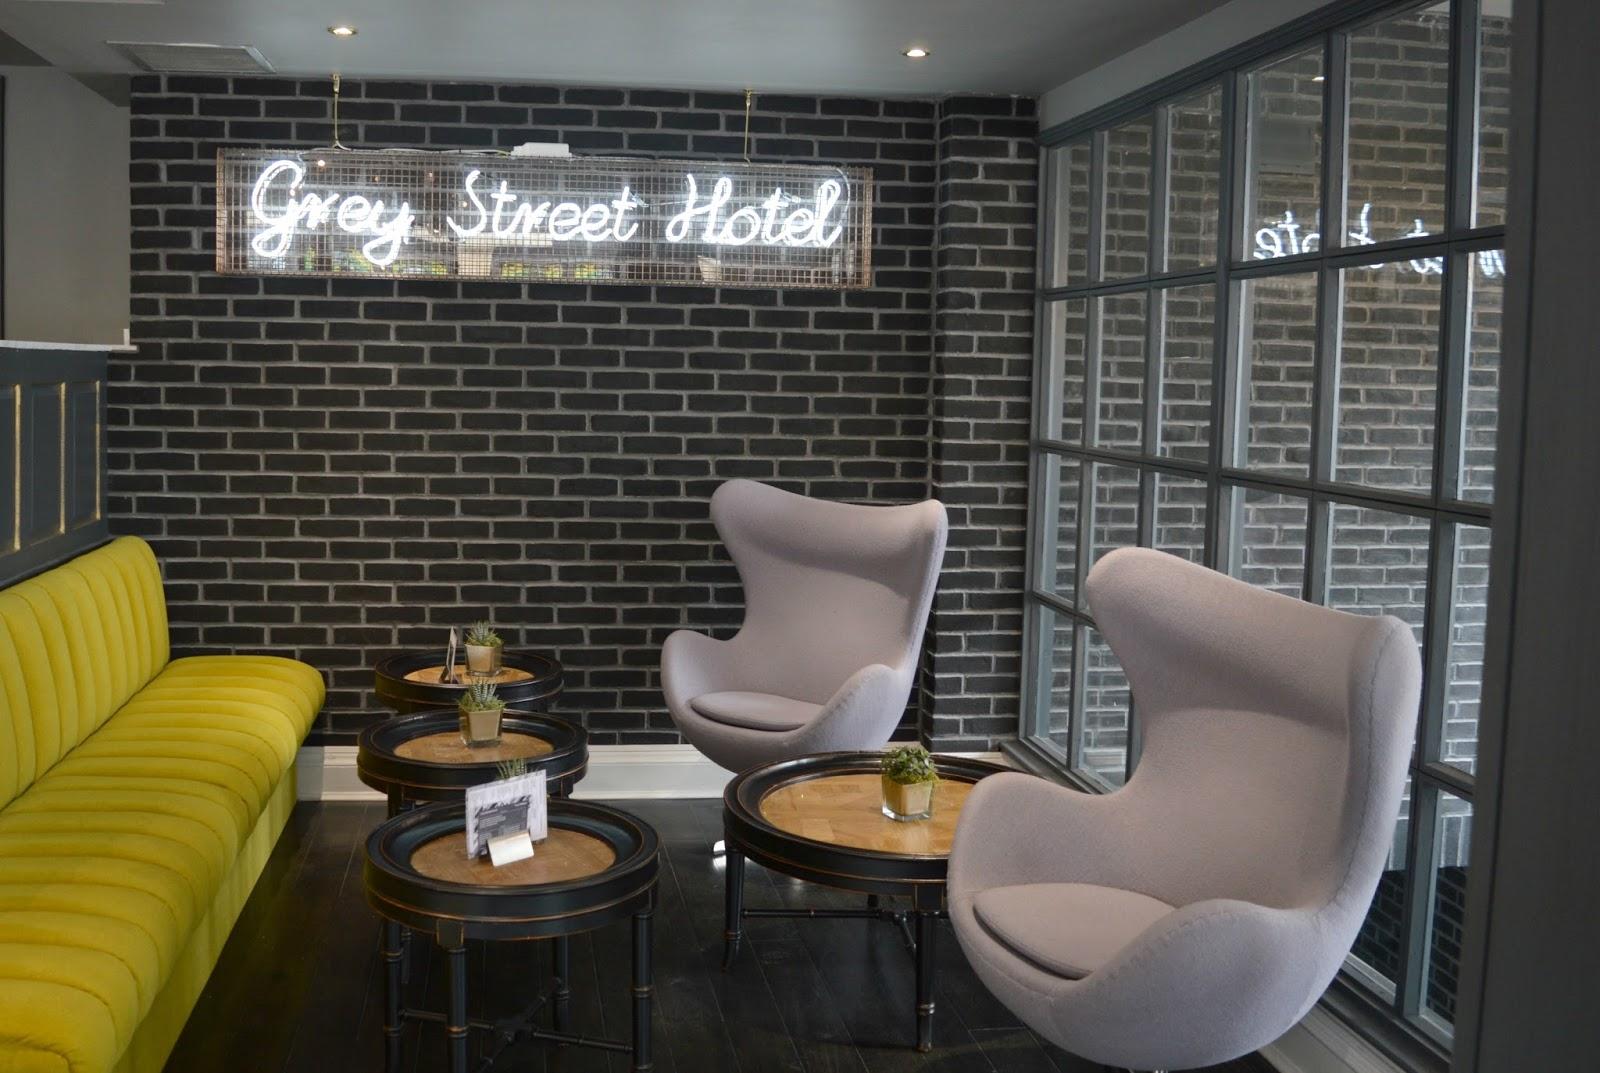 The Grey Street Hotel Newcastle